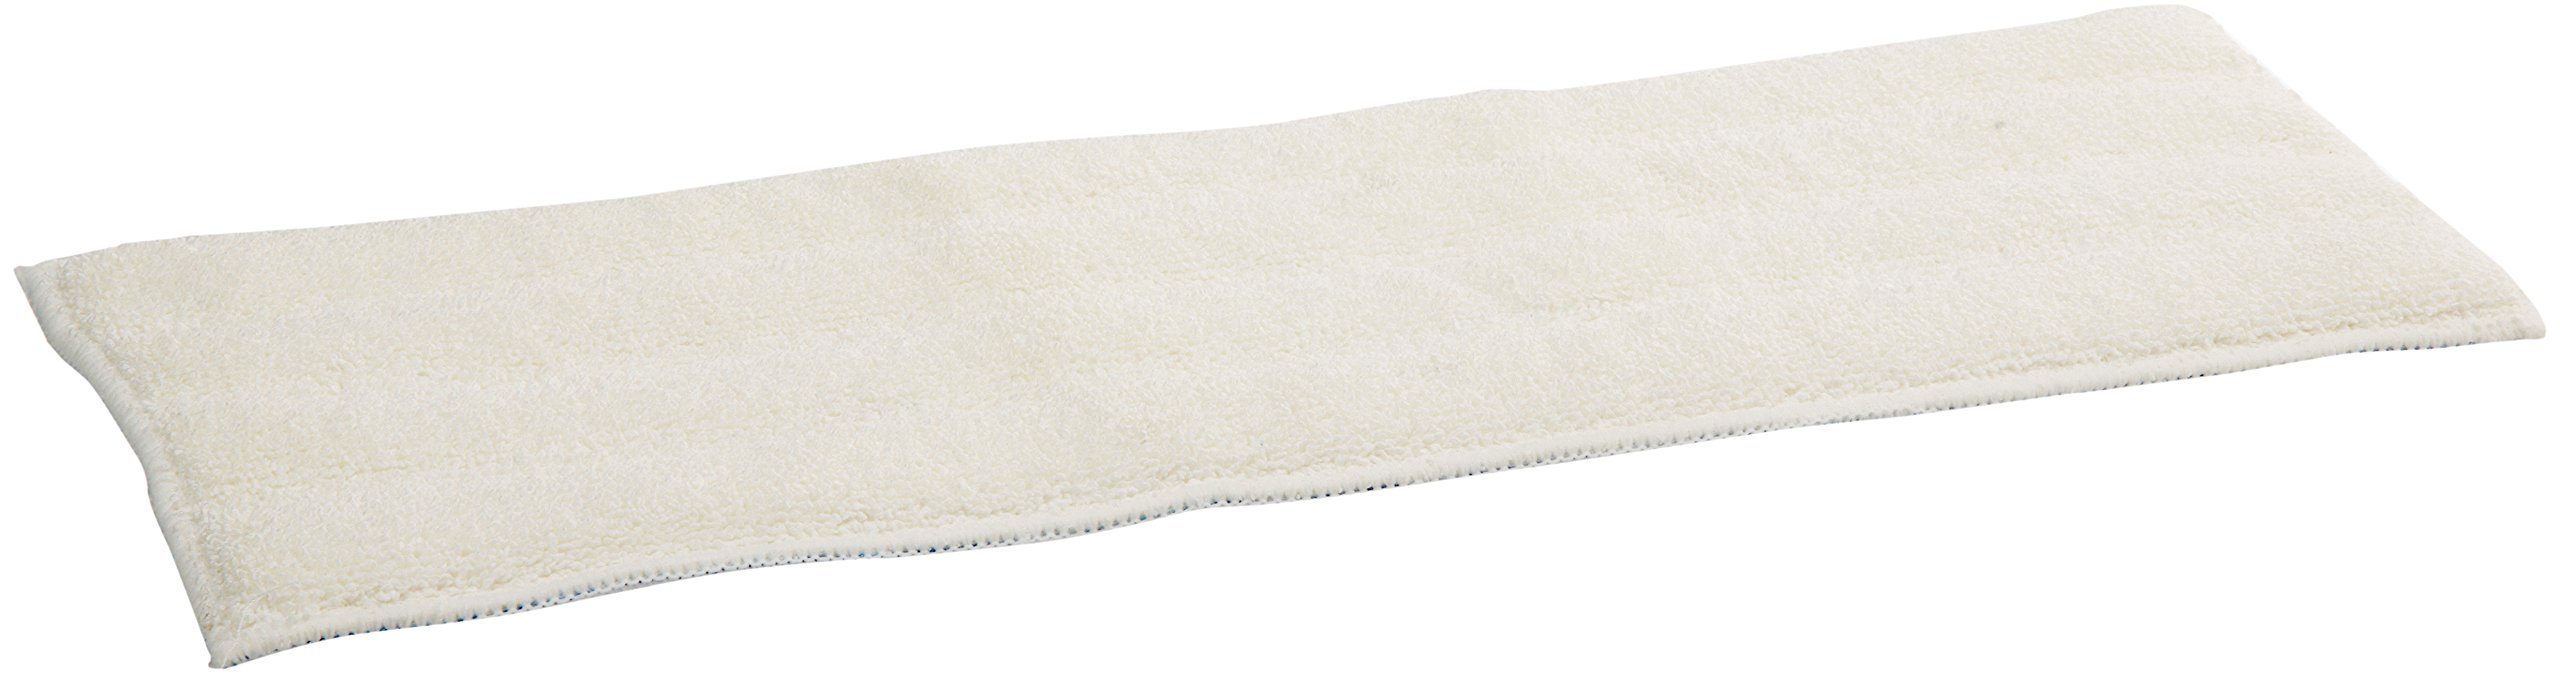 Impact LFFM18 Microfiber Finish Pad with Mesh Back, 18'' Length, White (10 Bags of 12)